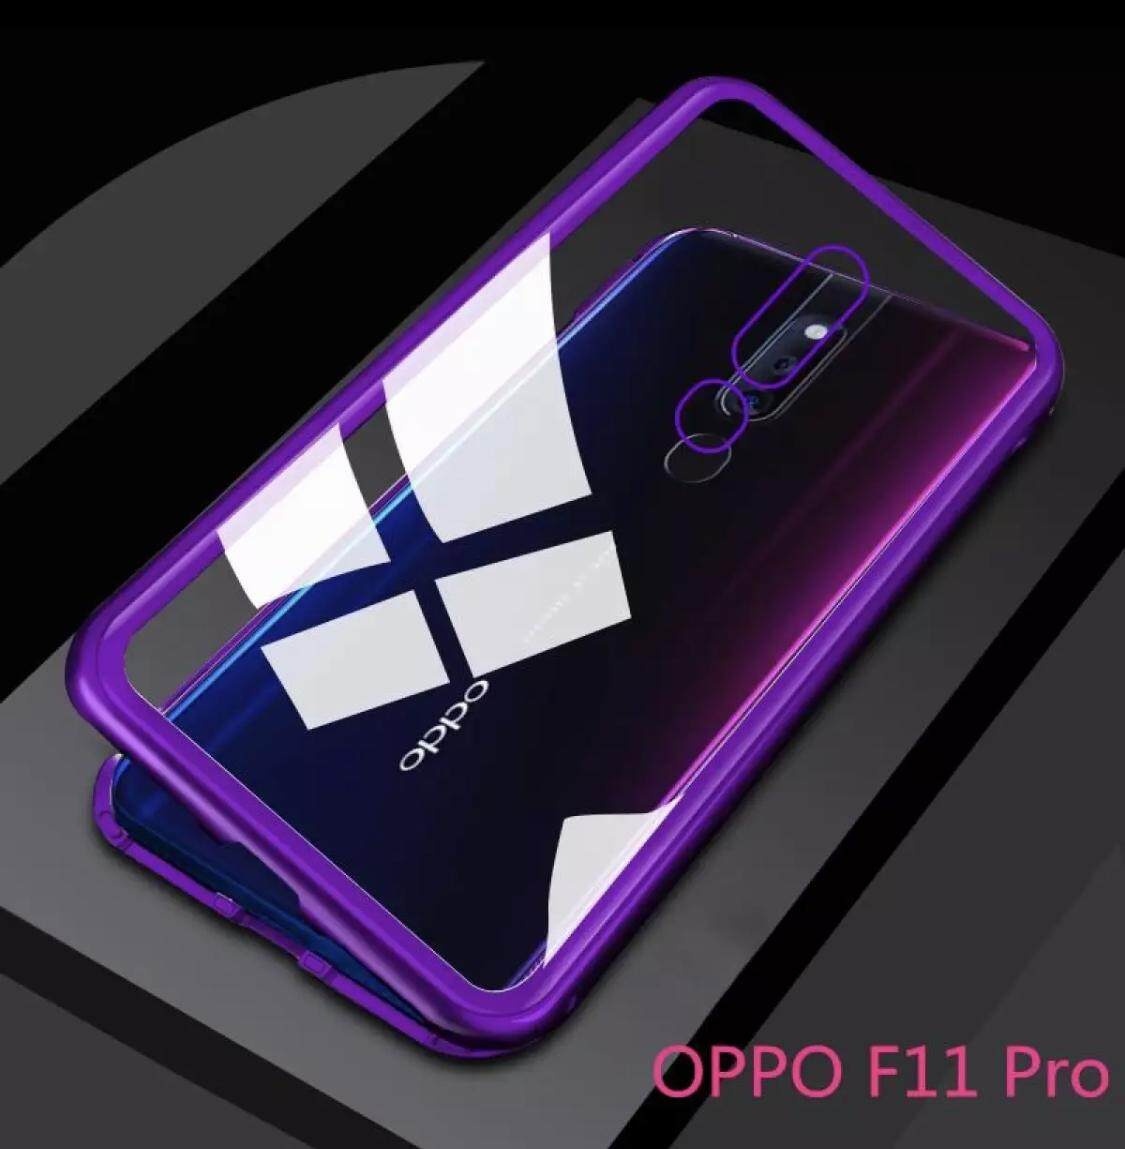 Case OPPO F11 Pro เคสออฟโป้ F11Pro เคส Oppo F11Pro สินค้าพร้อมจัดส่ง เคสแม่เหล็ก เคสประกบ360 Magnetic Case 360 degree เคส OPPO F11pro เคสมือถือ เคสกันกระแทก รุ่นใหม่ แม่เหล็ก ประกบ หน้า-หลัง สินค้าใหม่